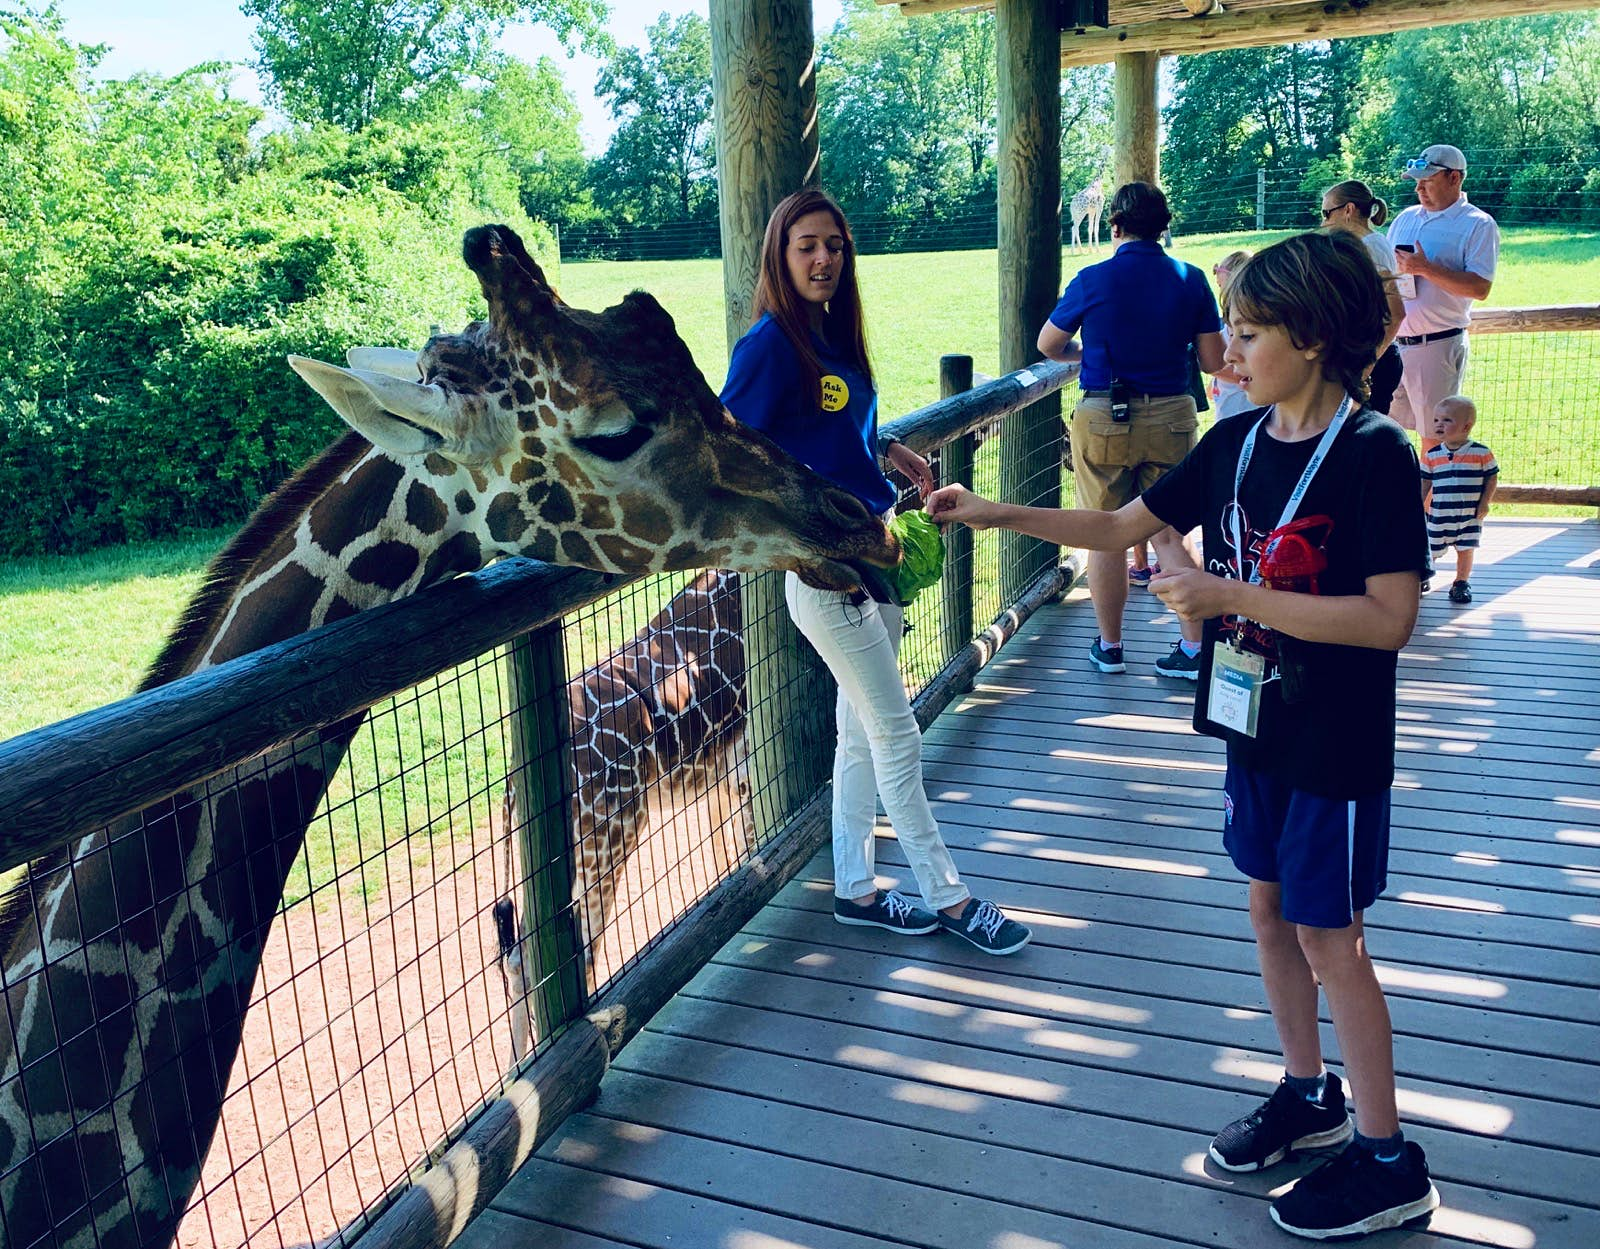 A boy feeds a giraffe at a zoo; midwest travel ideas